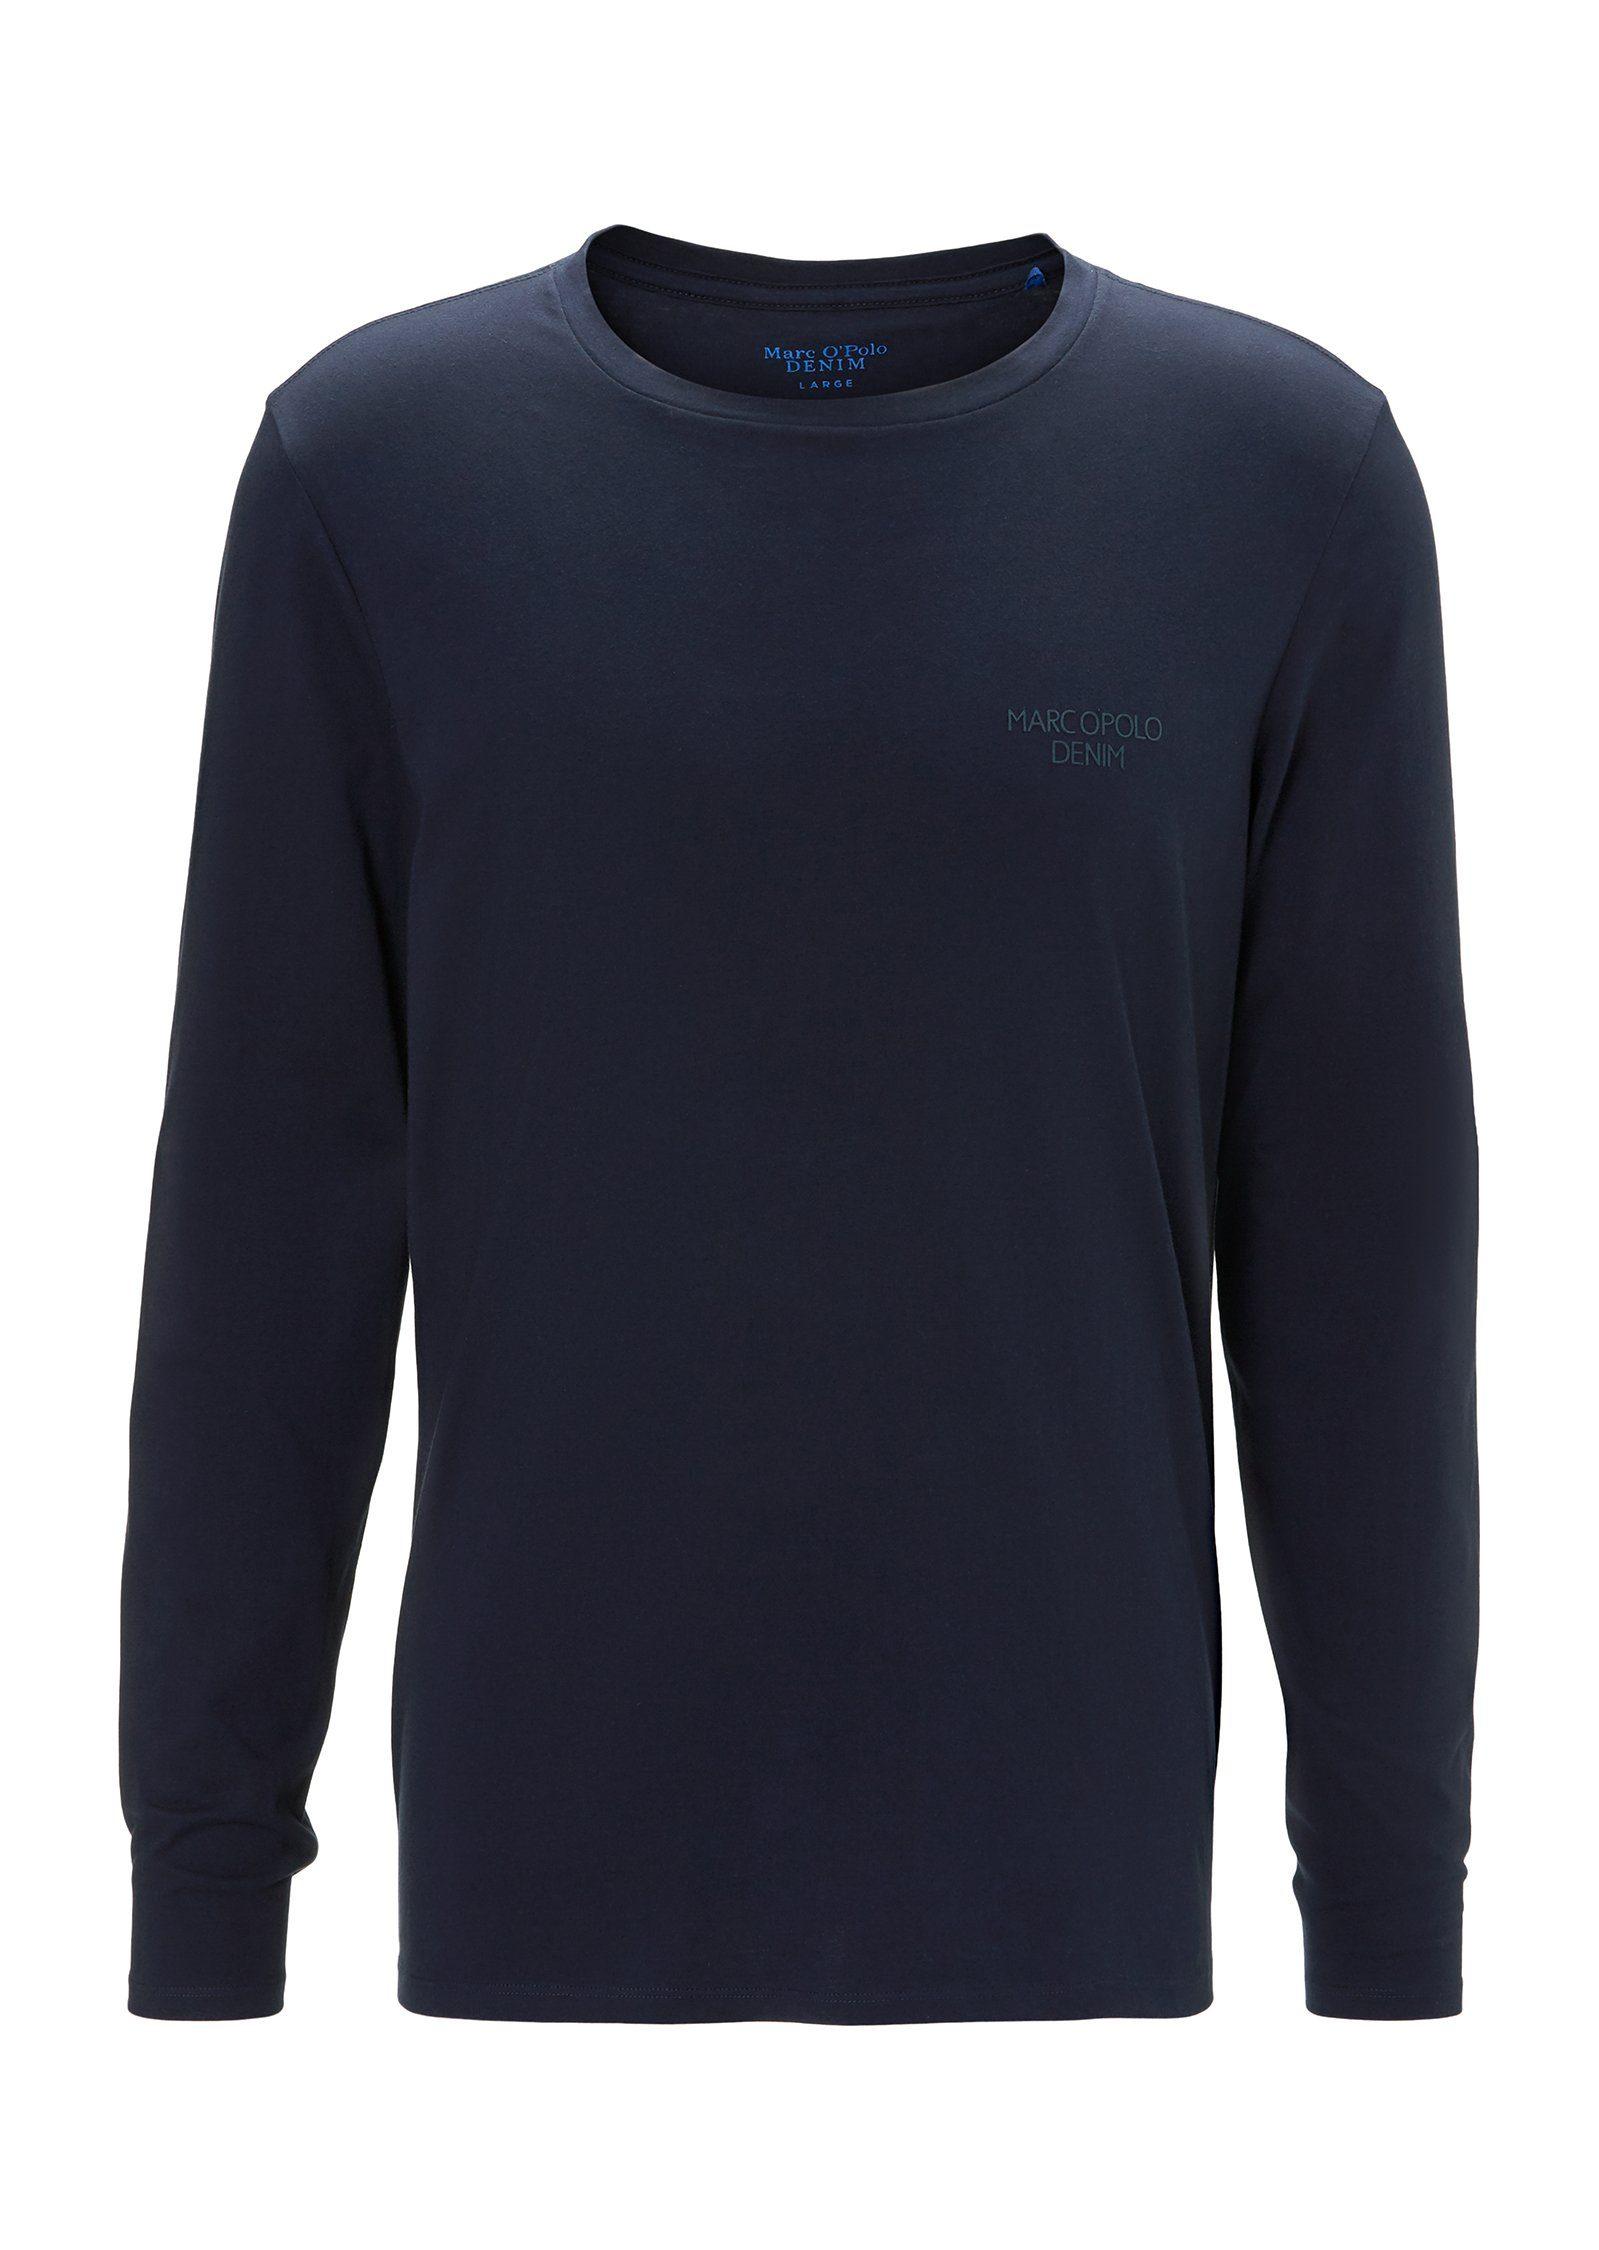 Langarmshirt Online Kaufen Marc O'polo Denim 35R4LjAq